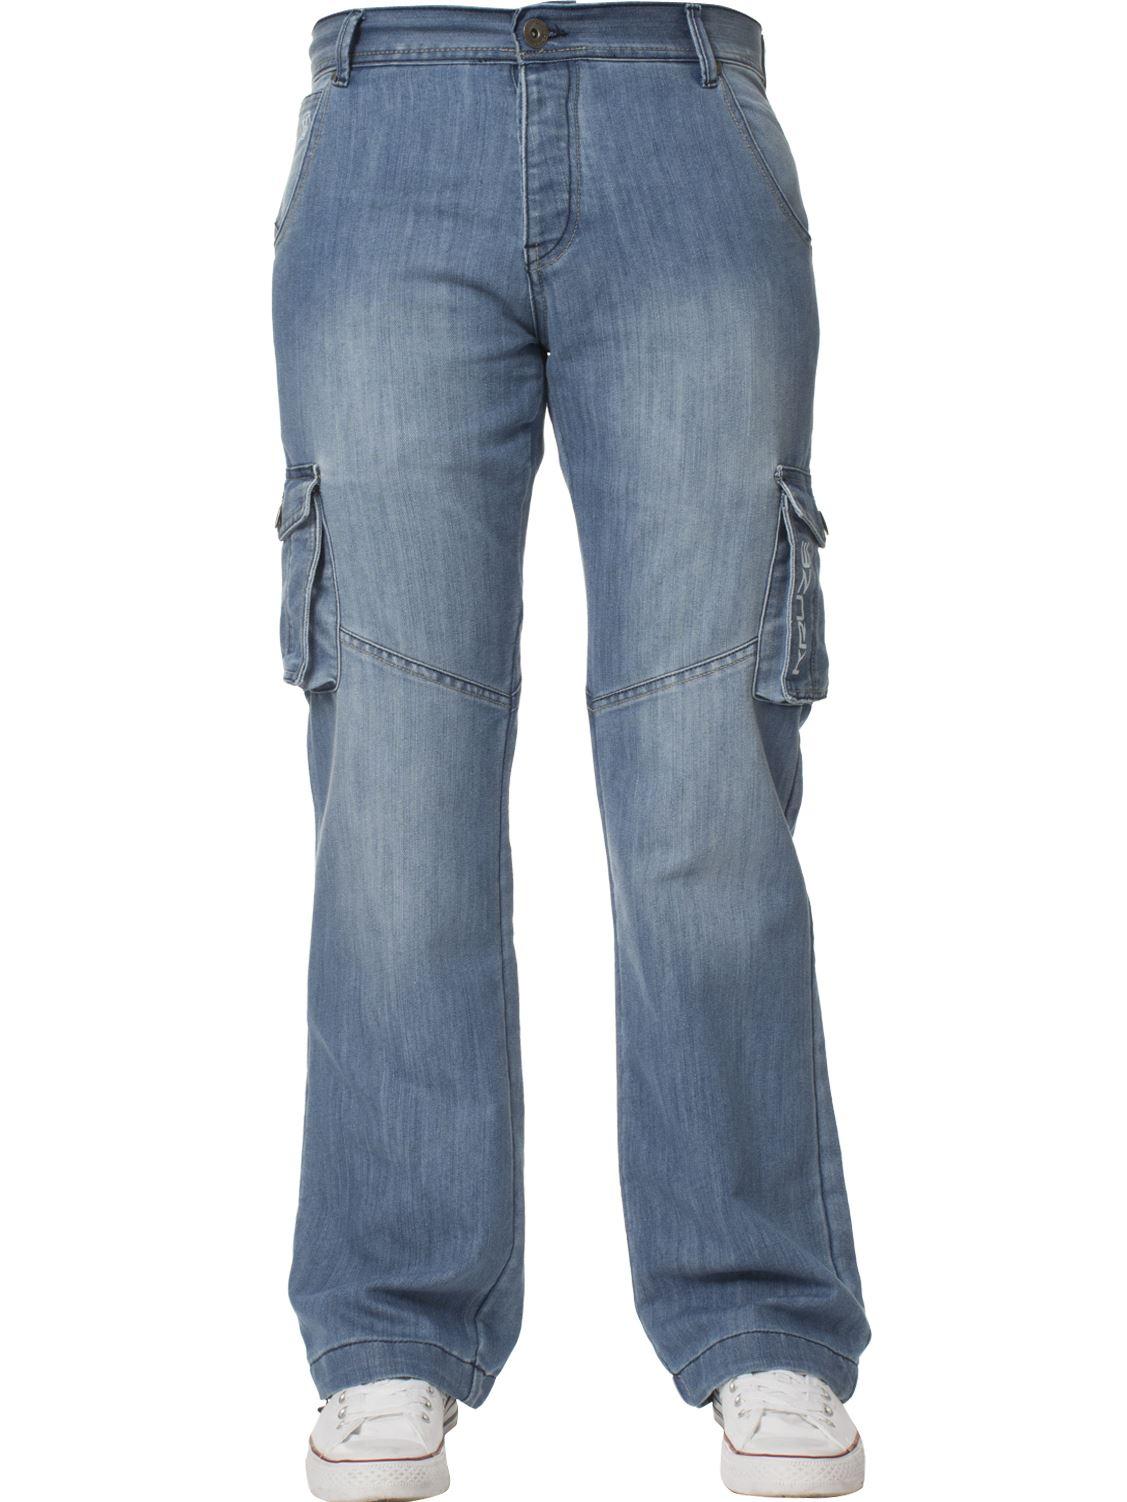 Grandes-jeans-para-hombre-de-combate-de-Kruze-Rey-Alto-Pierna-Cargo-Pantalones-Jeans-Pantalones miniatura 27